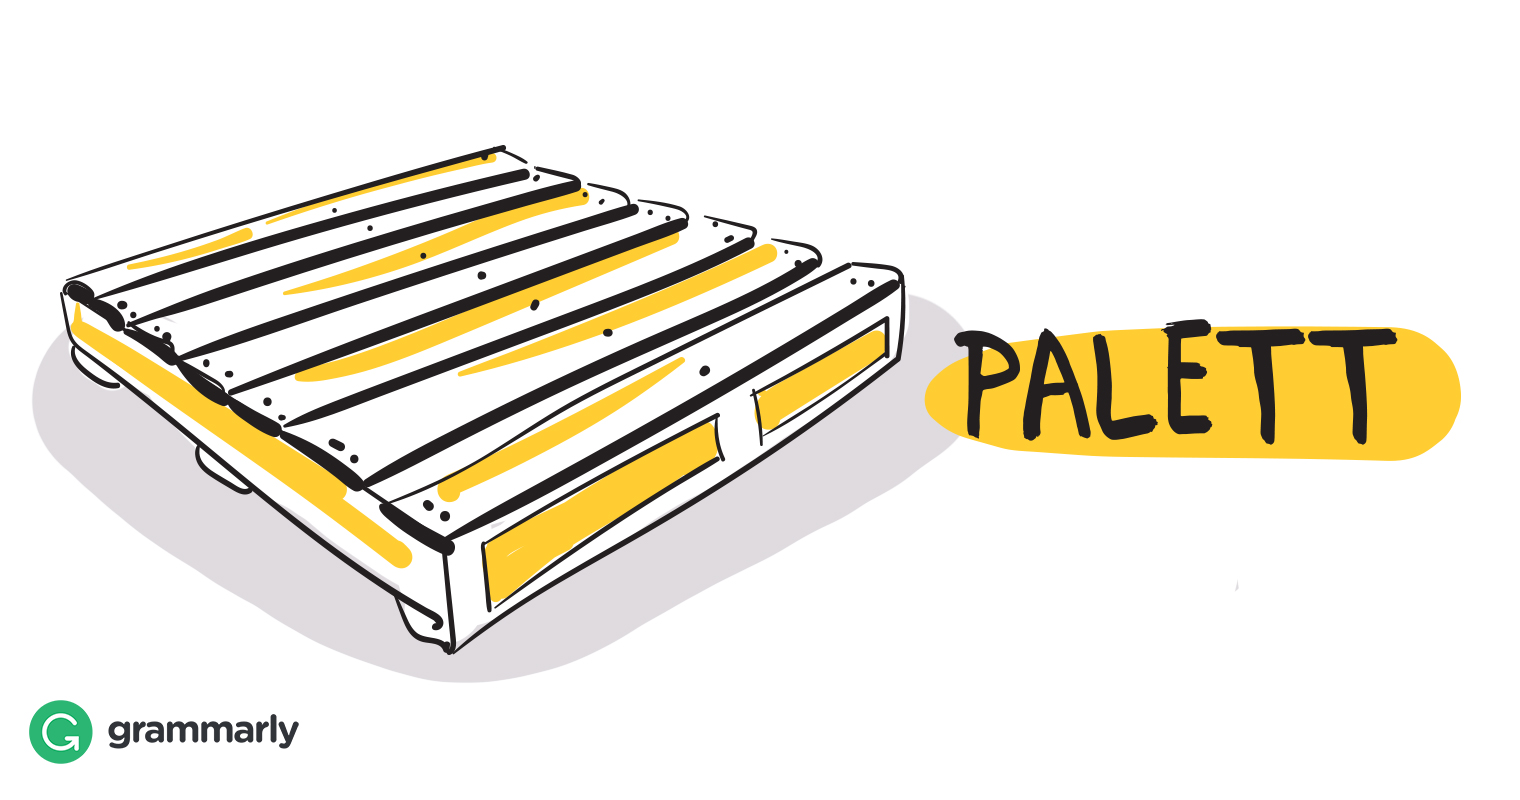 Palett definition drawing.